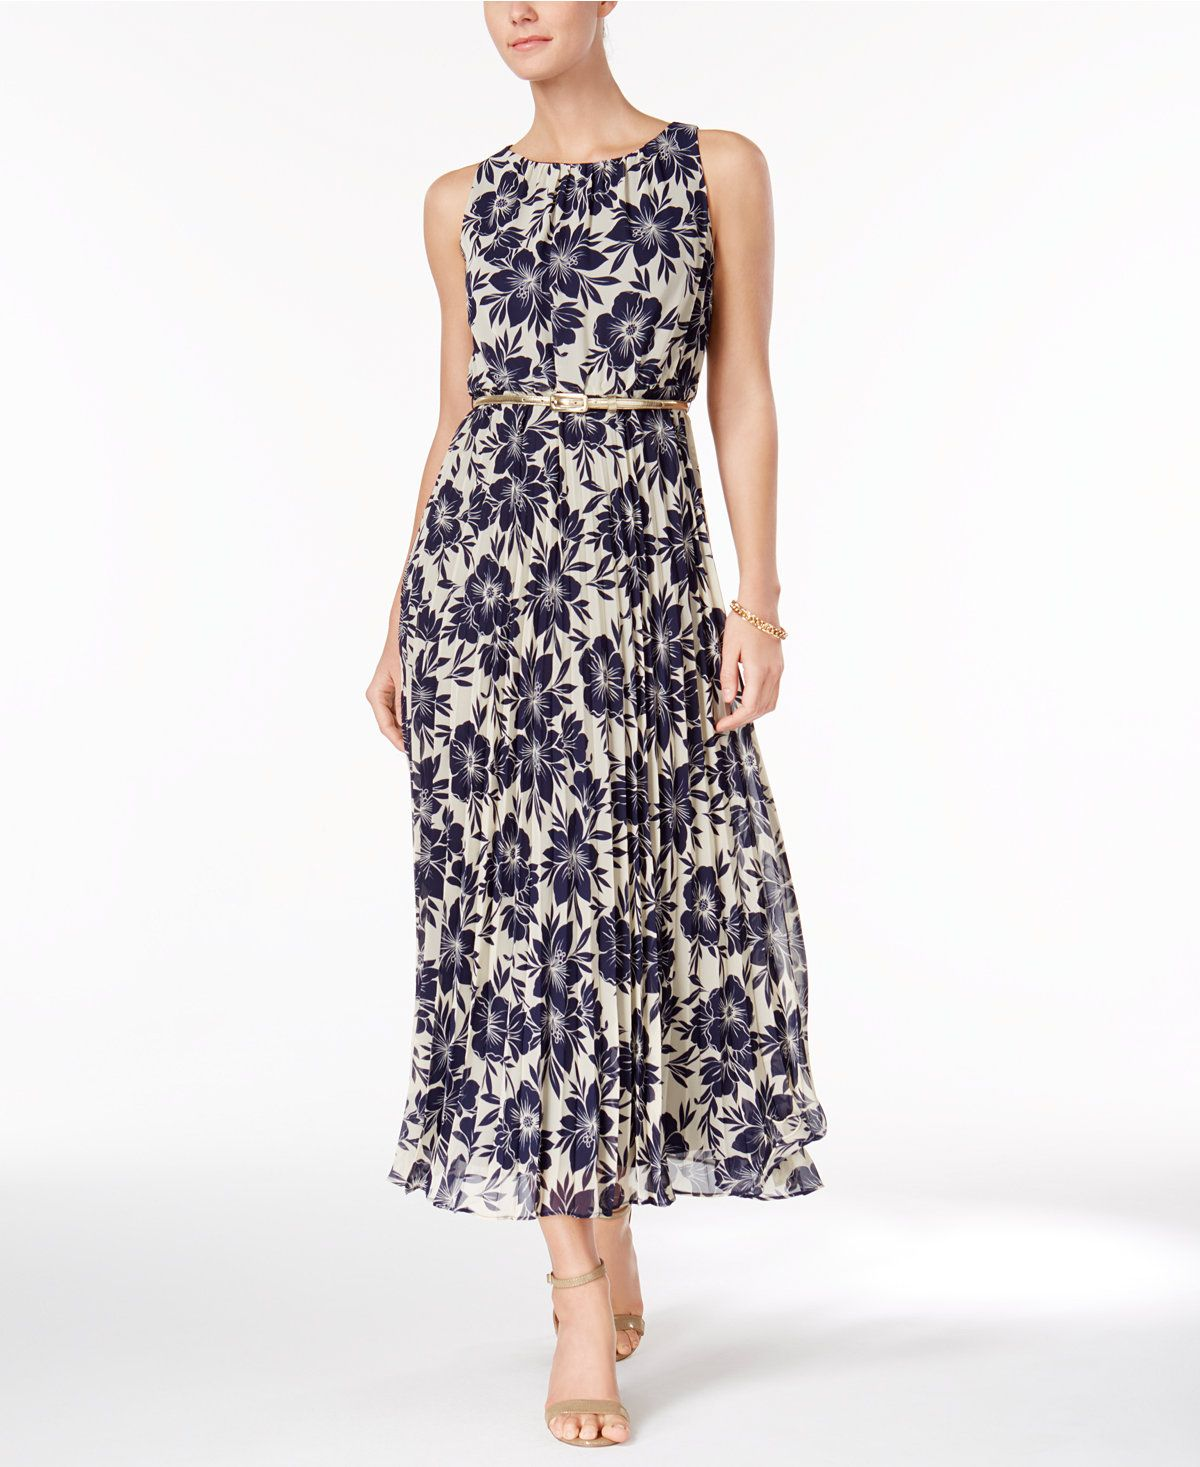 72a3624e7f Jessica Howard Petite Chiffon Floral-Print Maxi Dress - Petite Maxi Dress -  SLP - Macy s